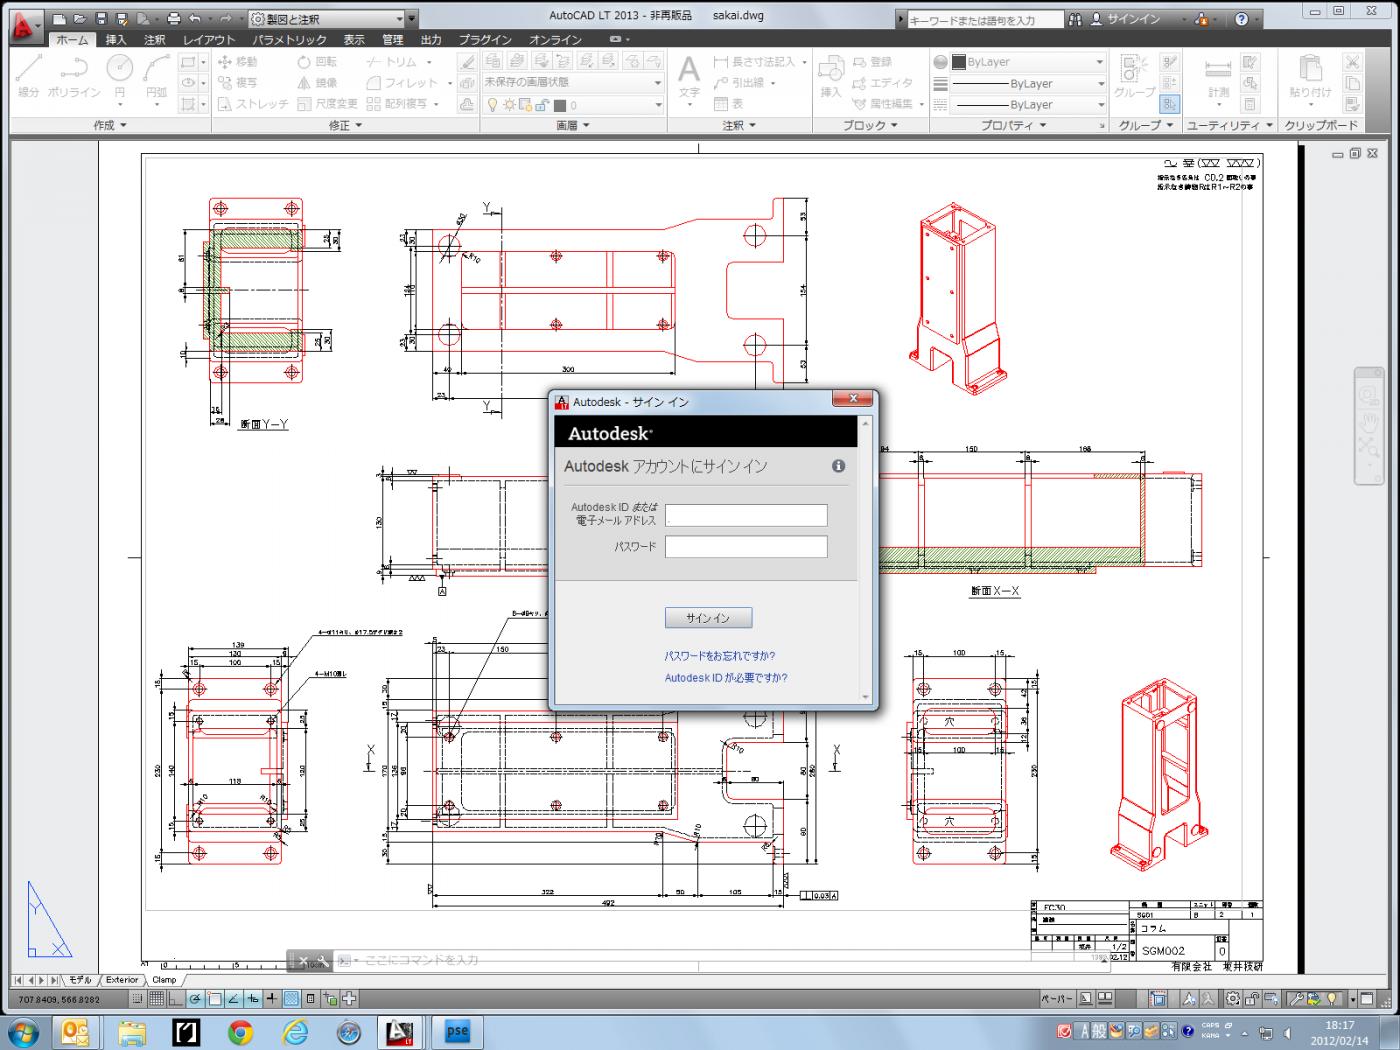 Buy autodesk autocad lt 2014 64 bit download for windows down autodesk autocad lt 2013 screenshot autodesk autocad lt 2013 screenshot baditri Images